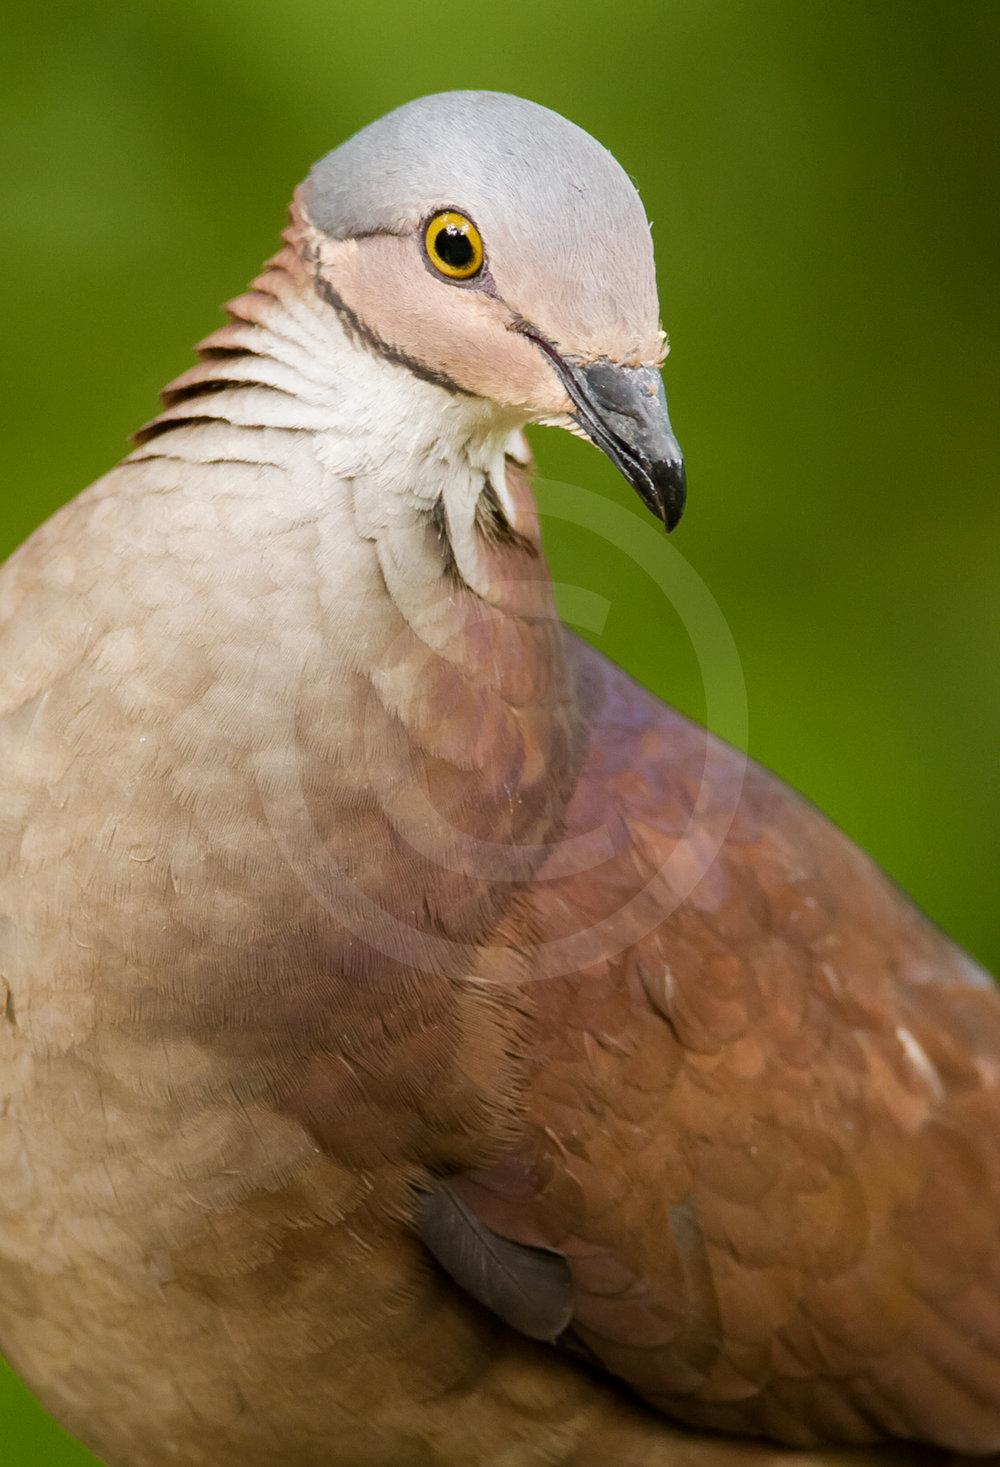 White-throated Quail Dove